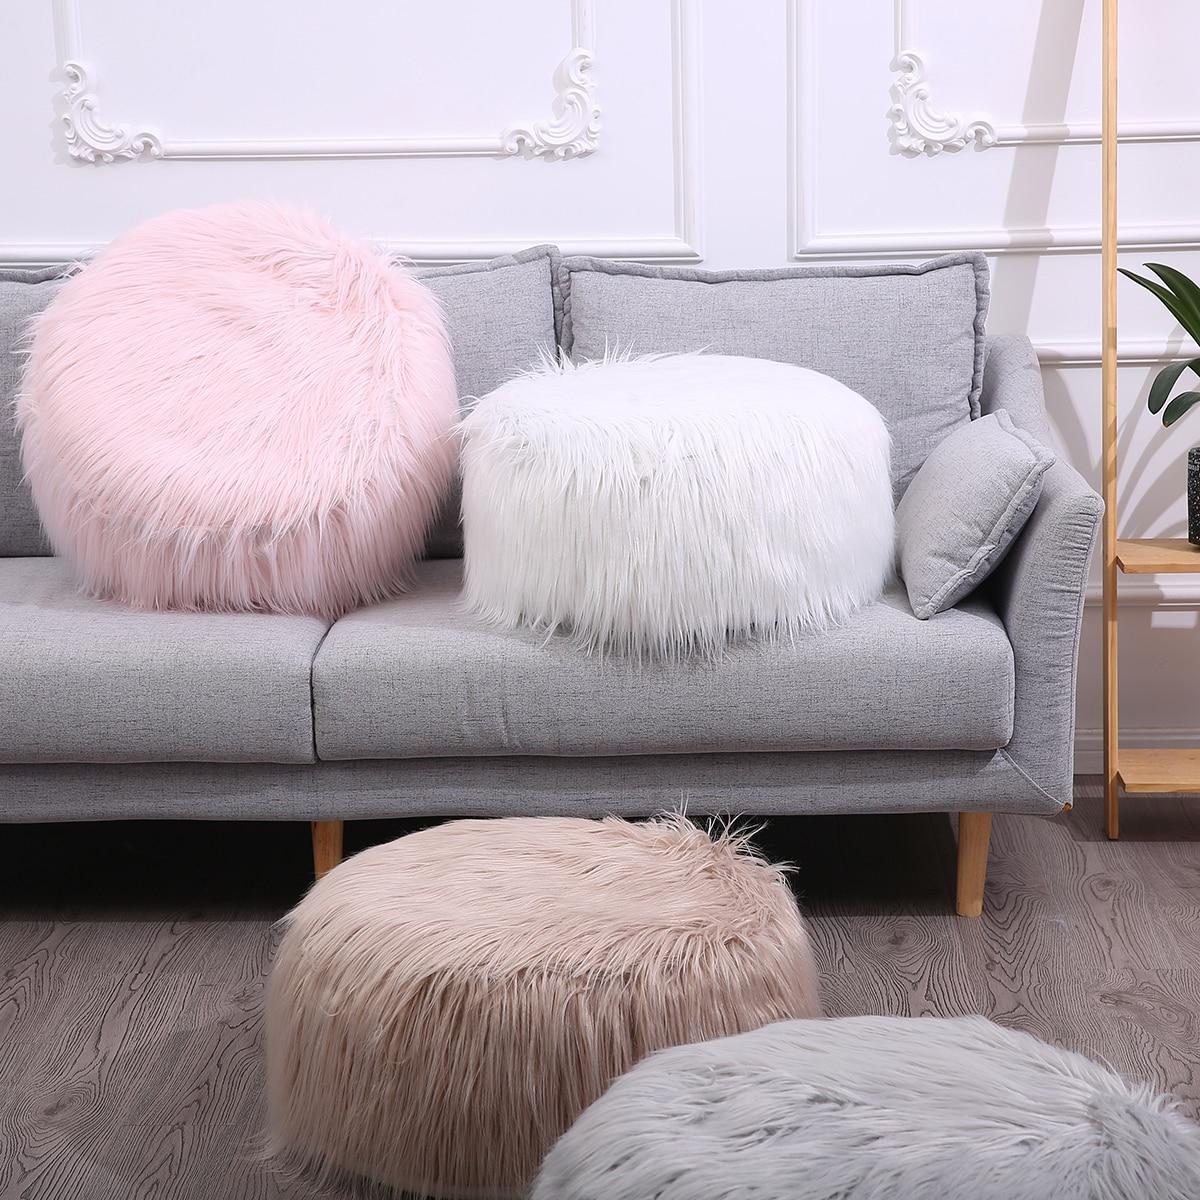 faux sheepskin bean bag chair soft fur beanbag fluffy small round lazy beanbag sofa portable inflatable christmas decor q20